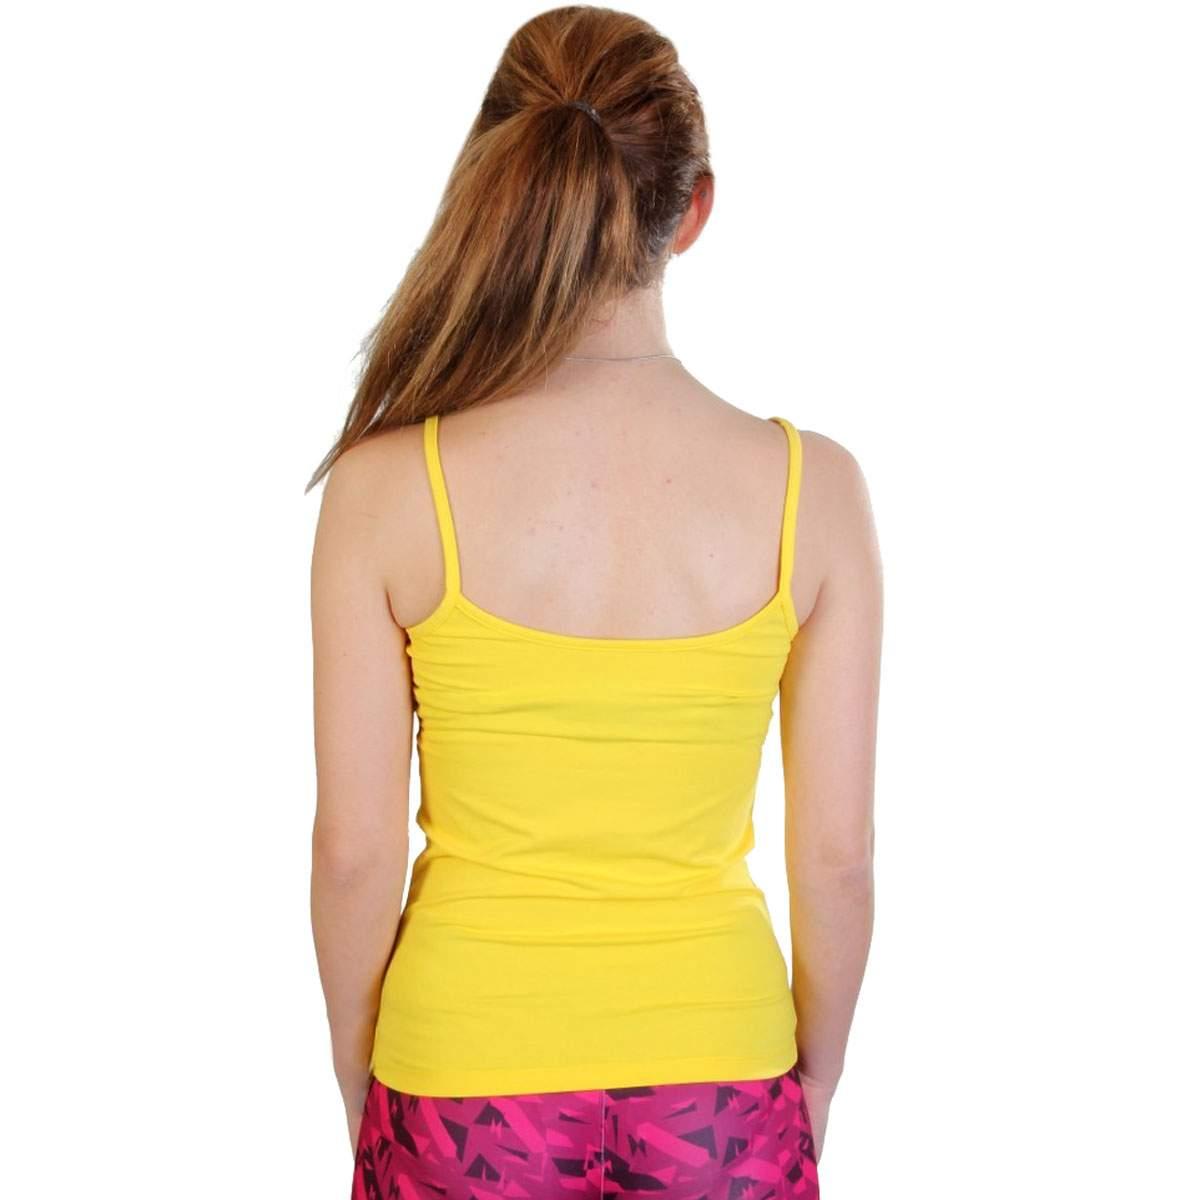 Sportive Supspalet Kadın Atlet